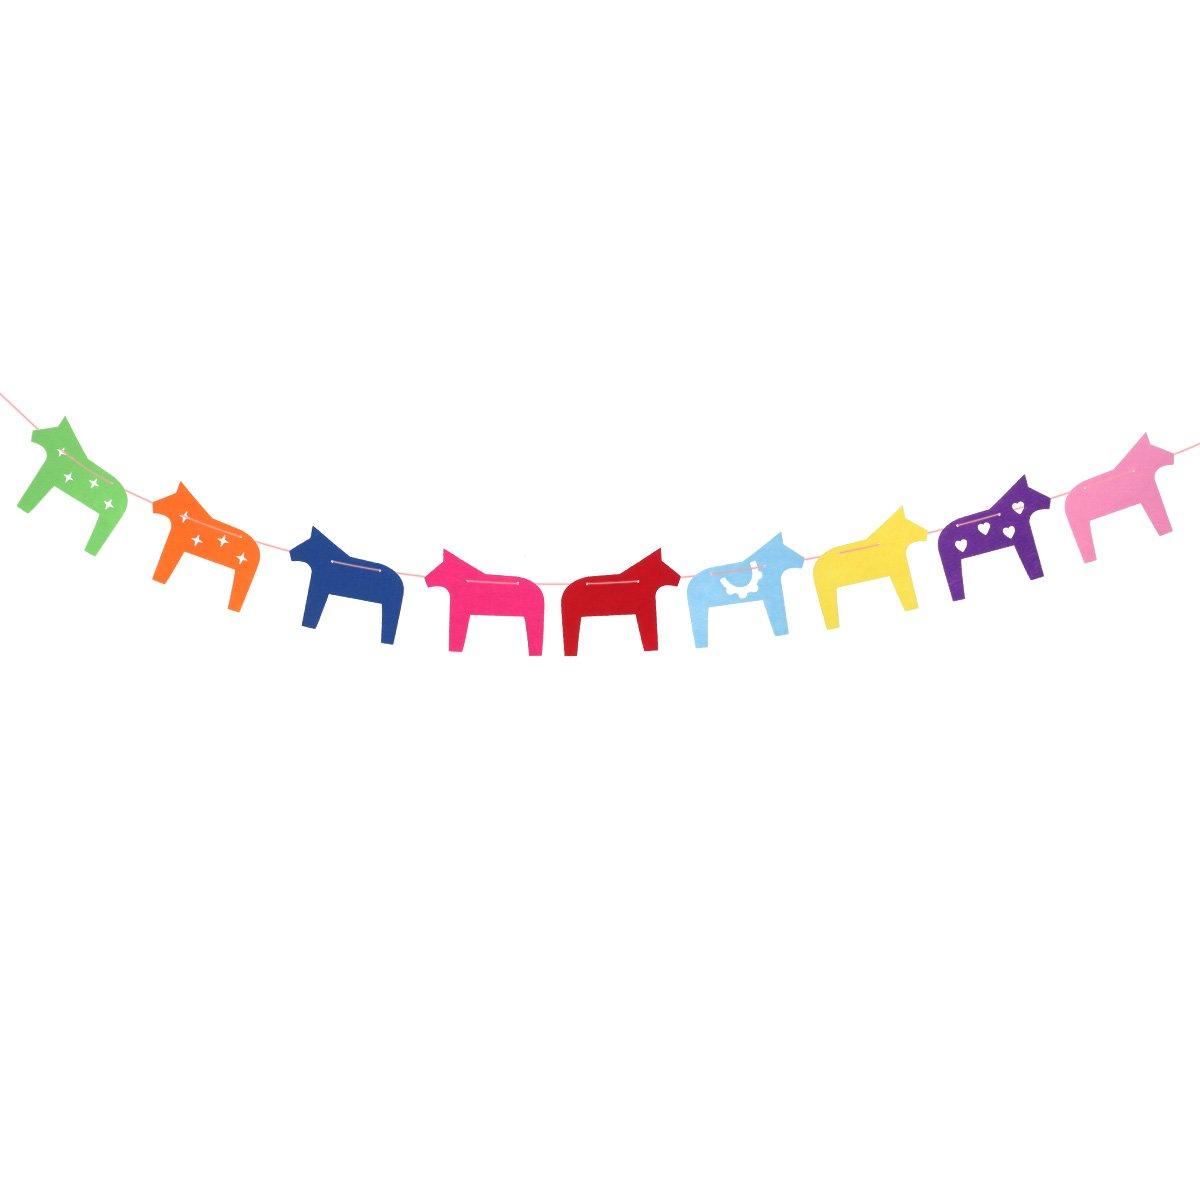 BESTOYARD 2.5M カラフル 馬 動物 旗 バンティング バナー レインボー バンティング ガーランド パーティー 誕生日 子供部屋用 (ランダムカラー)   B07GR77DCT